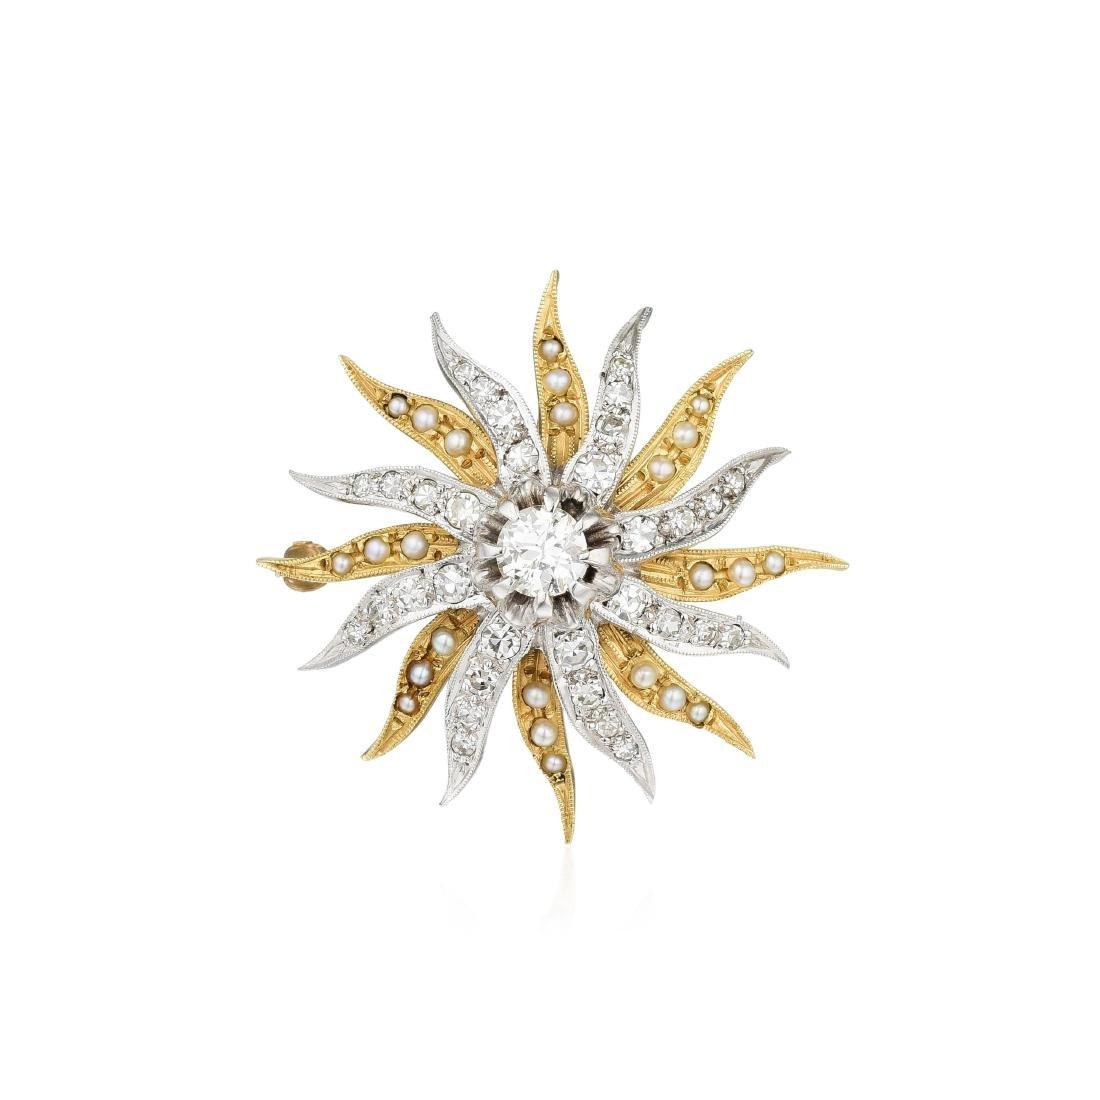 An Antique Sunburst Diamond and Pearl Brooch/Pendant